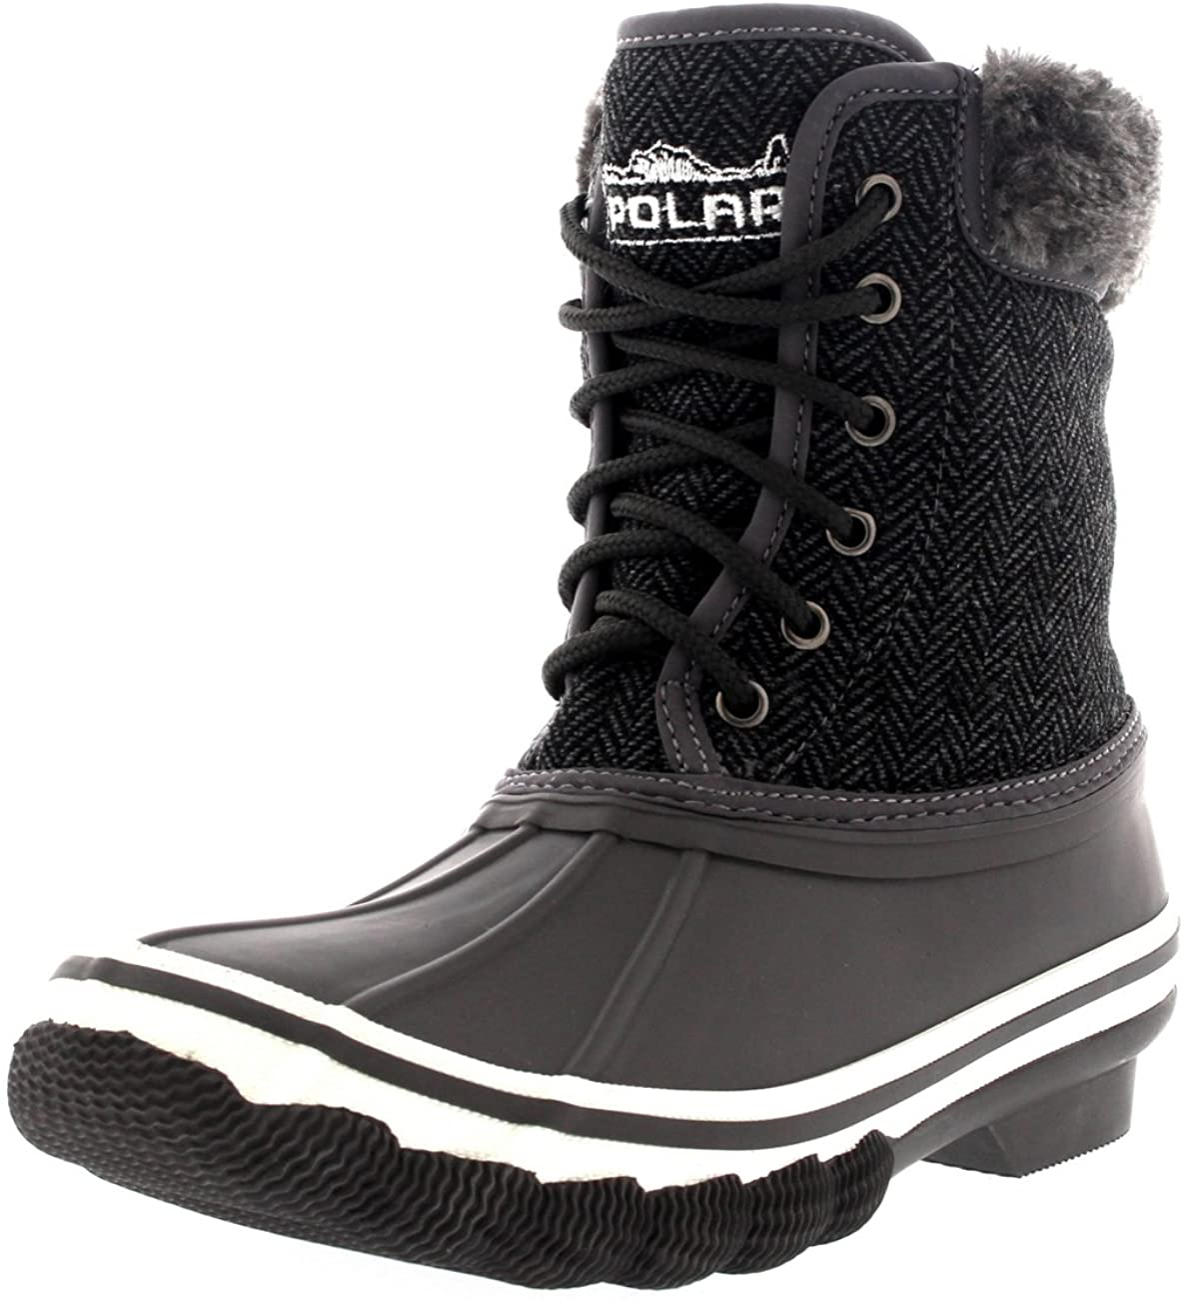 Womens Rubber Sole Deep Tread Winter Textile Snow Rain Boots